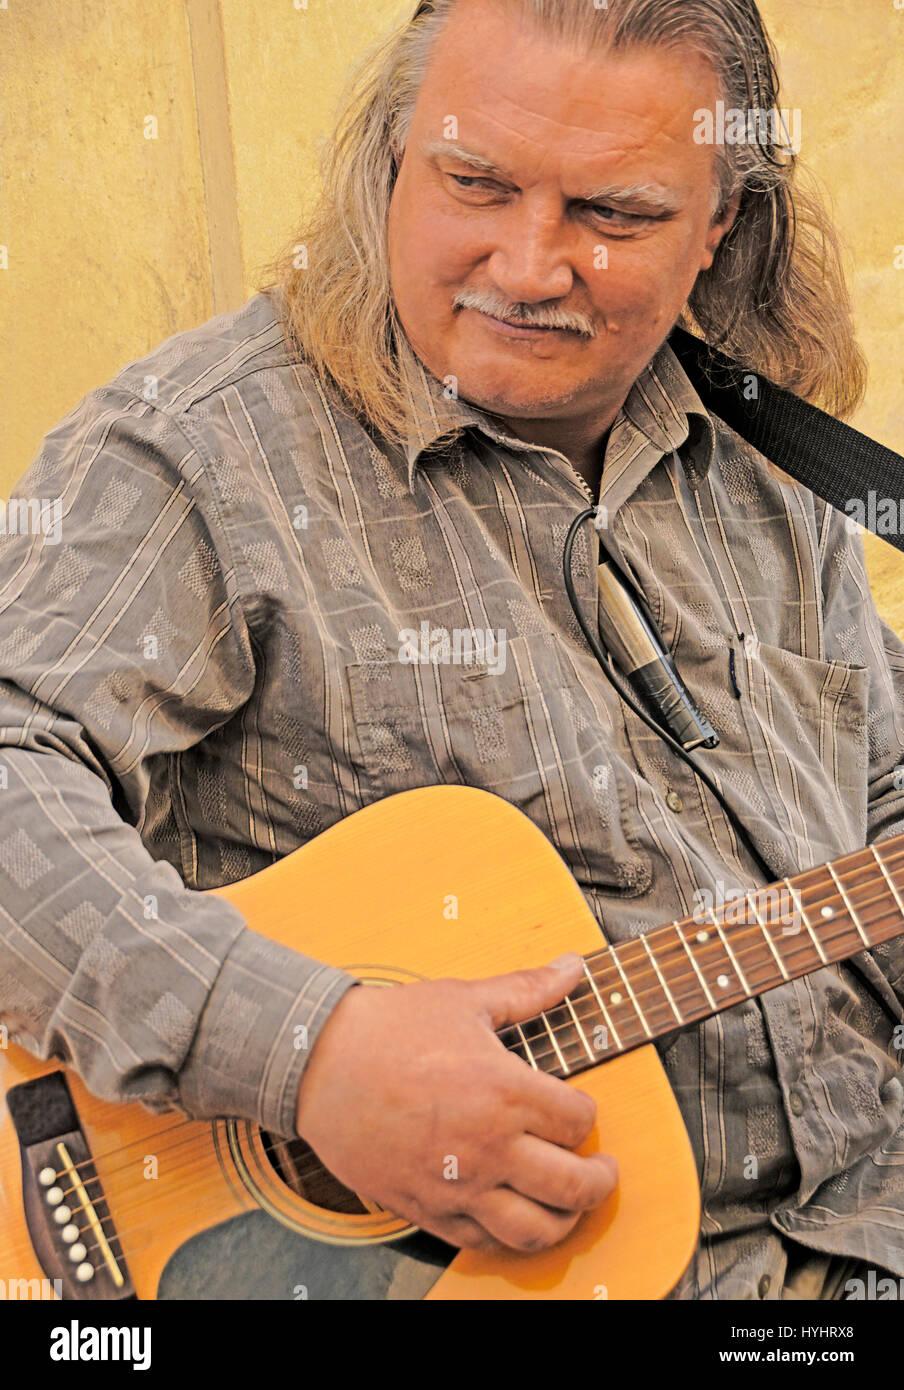 Guitar street musician in Tallinn, Estonia. - Stock Image